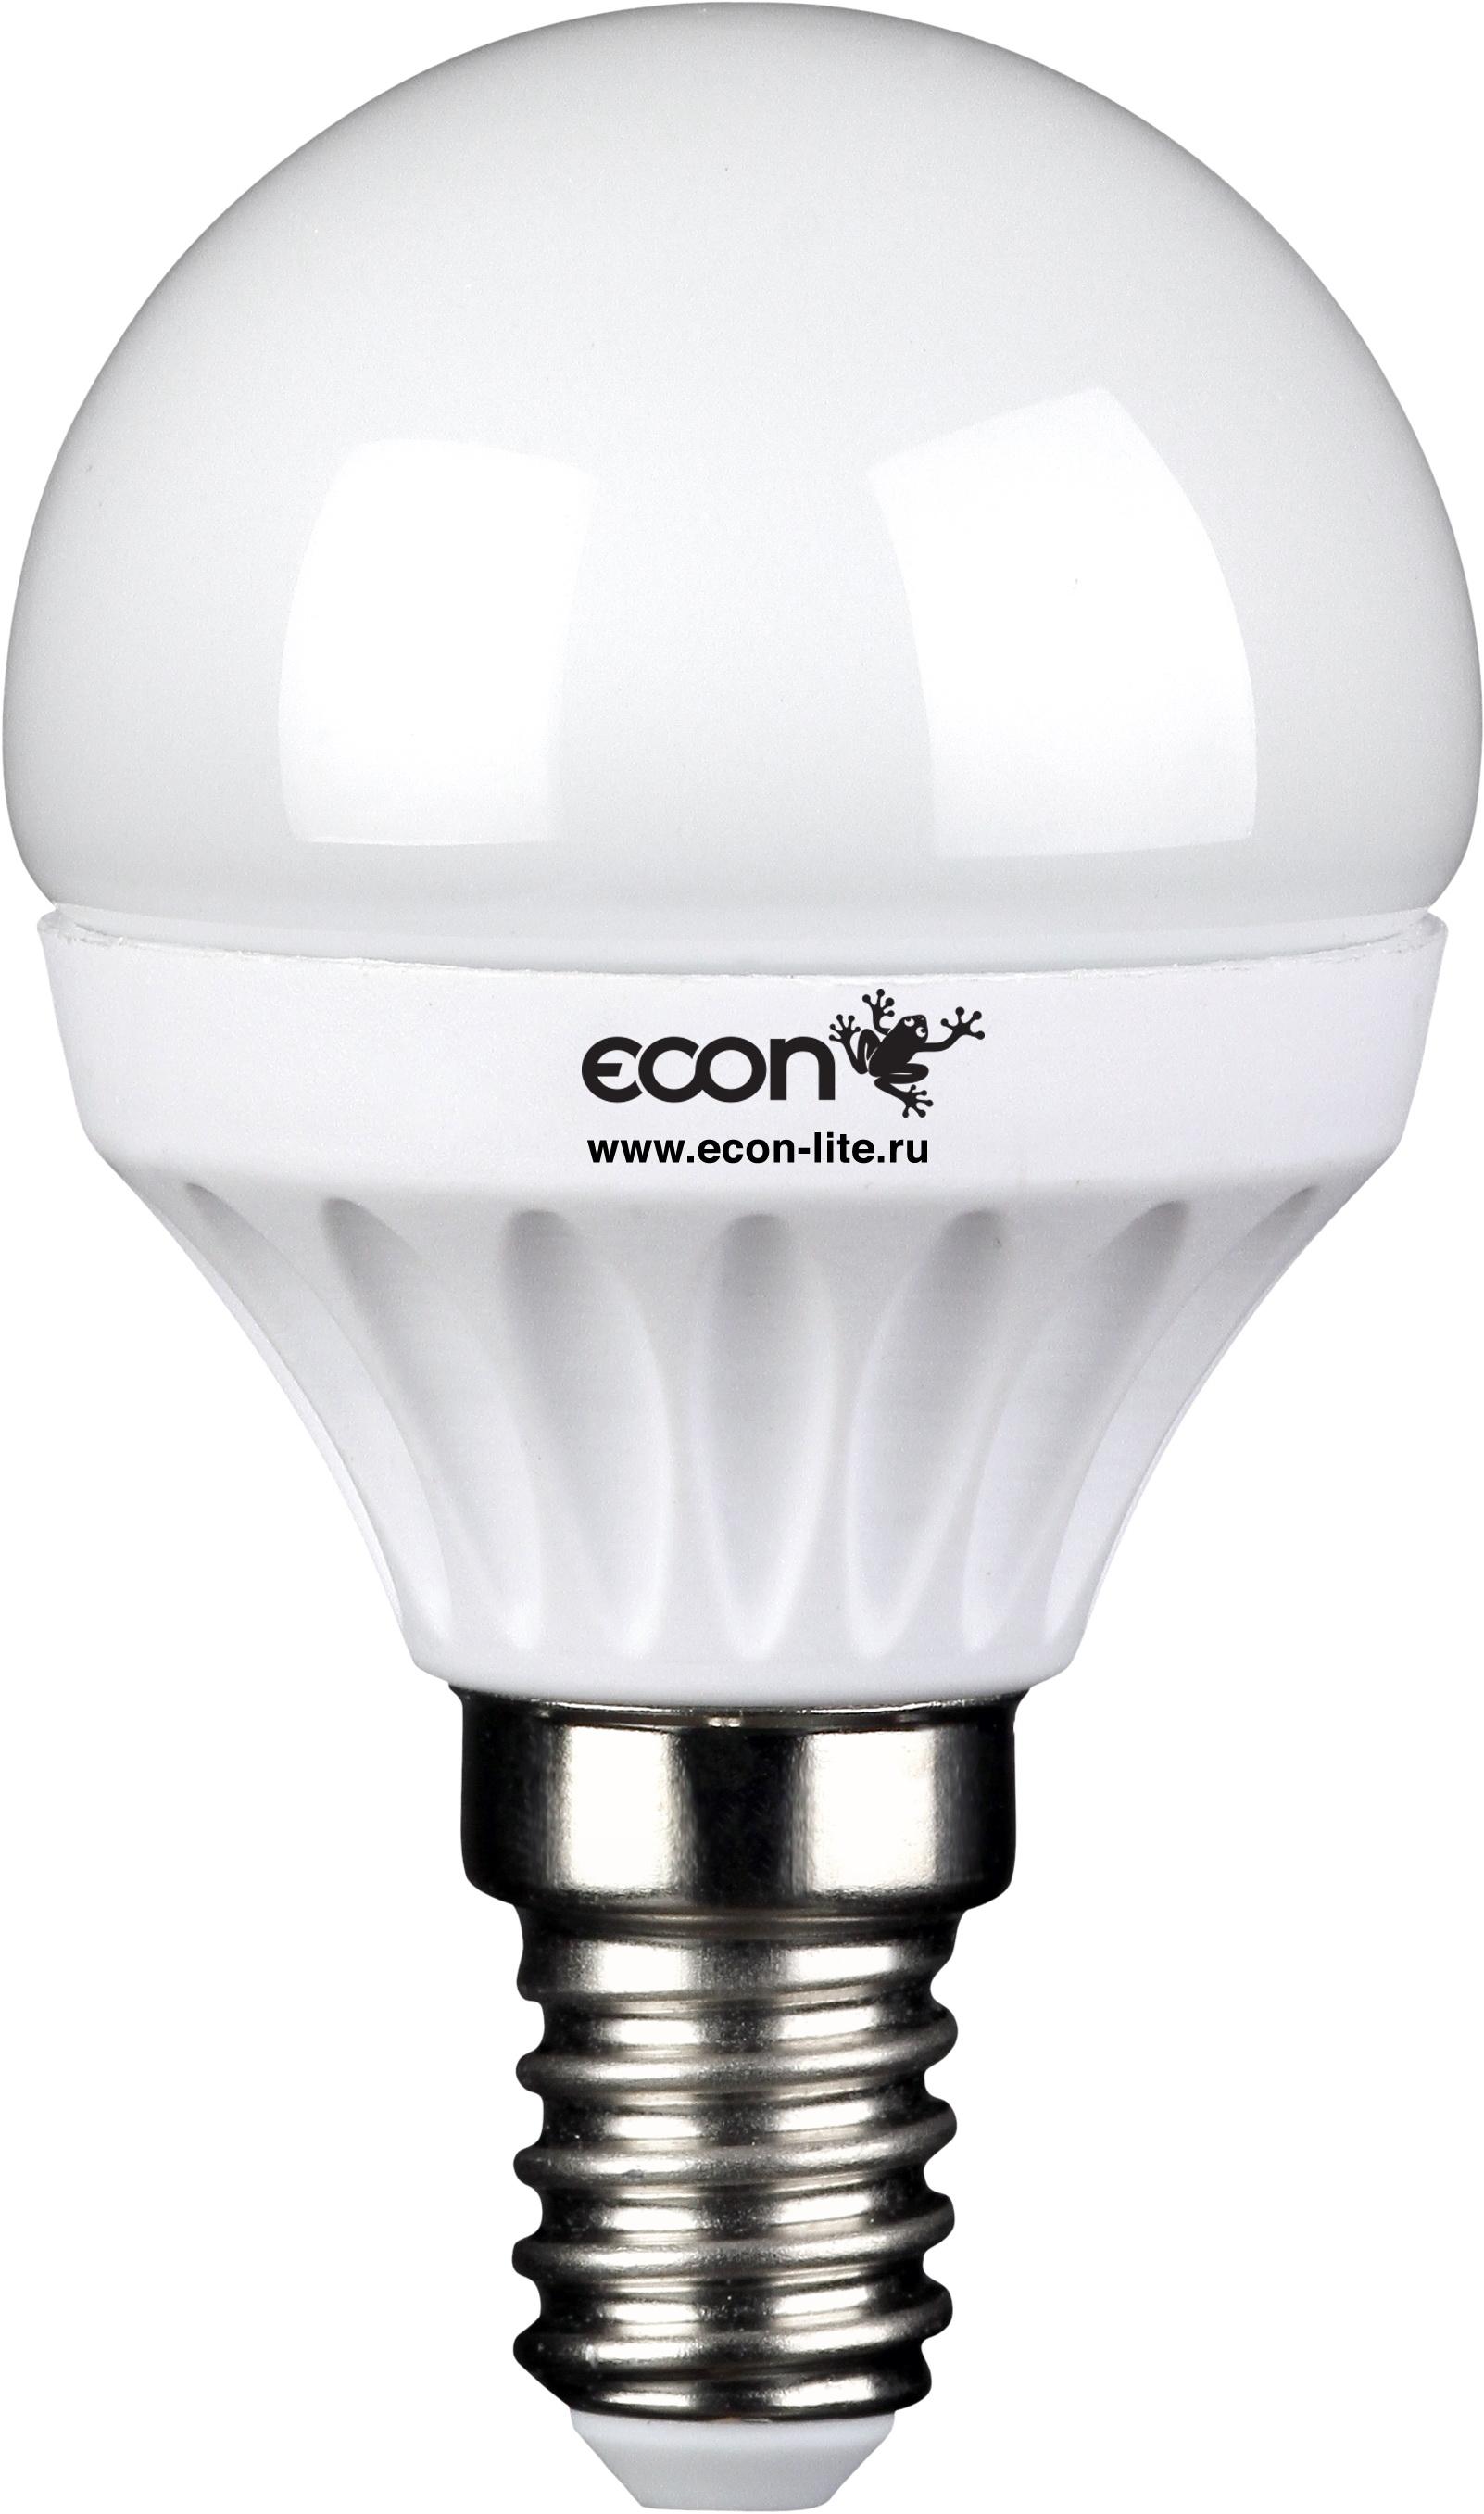 Лампа светодиодная Econ Led p 5Вт e14 3000k p45 tiremet titanium ti multi function edc screwdriver bottle opener spanner emergency survival tool trg001